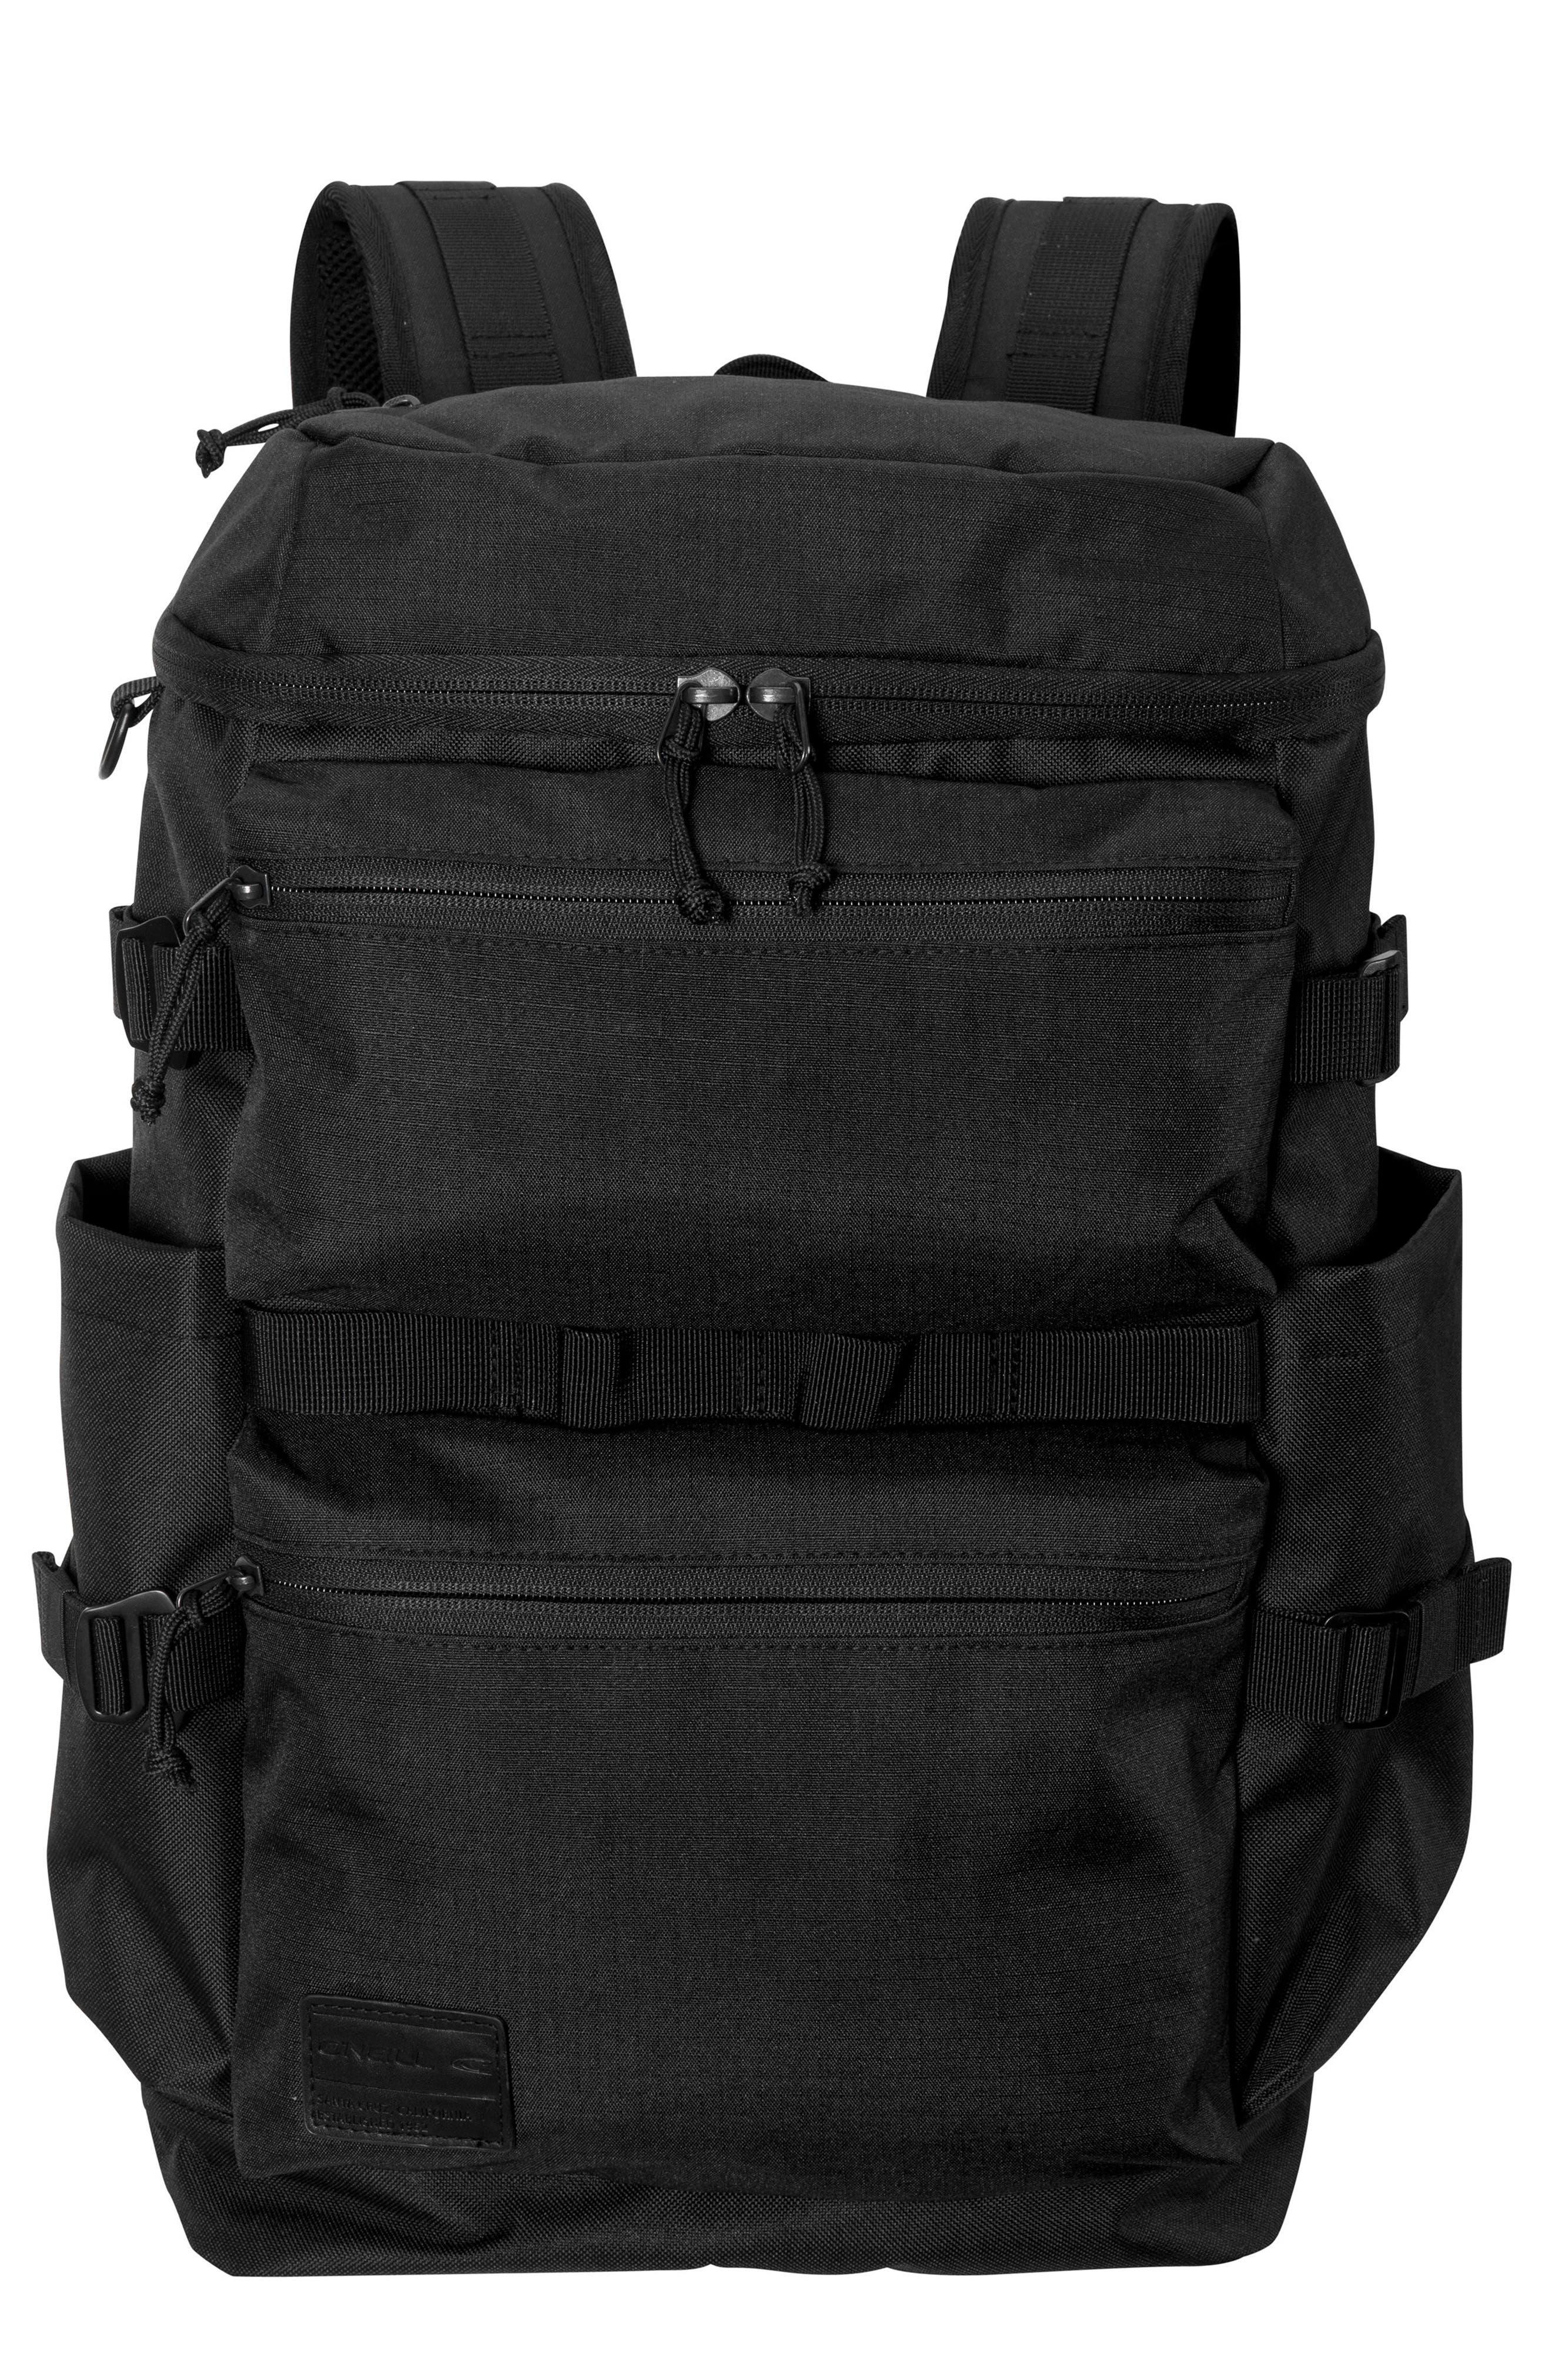 Alternate Image 1 Selected - O'Neill Hammond Backpack